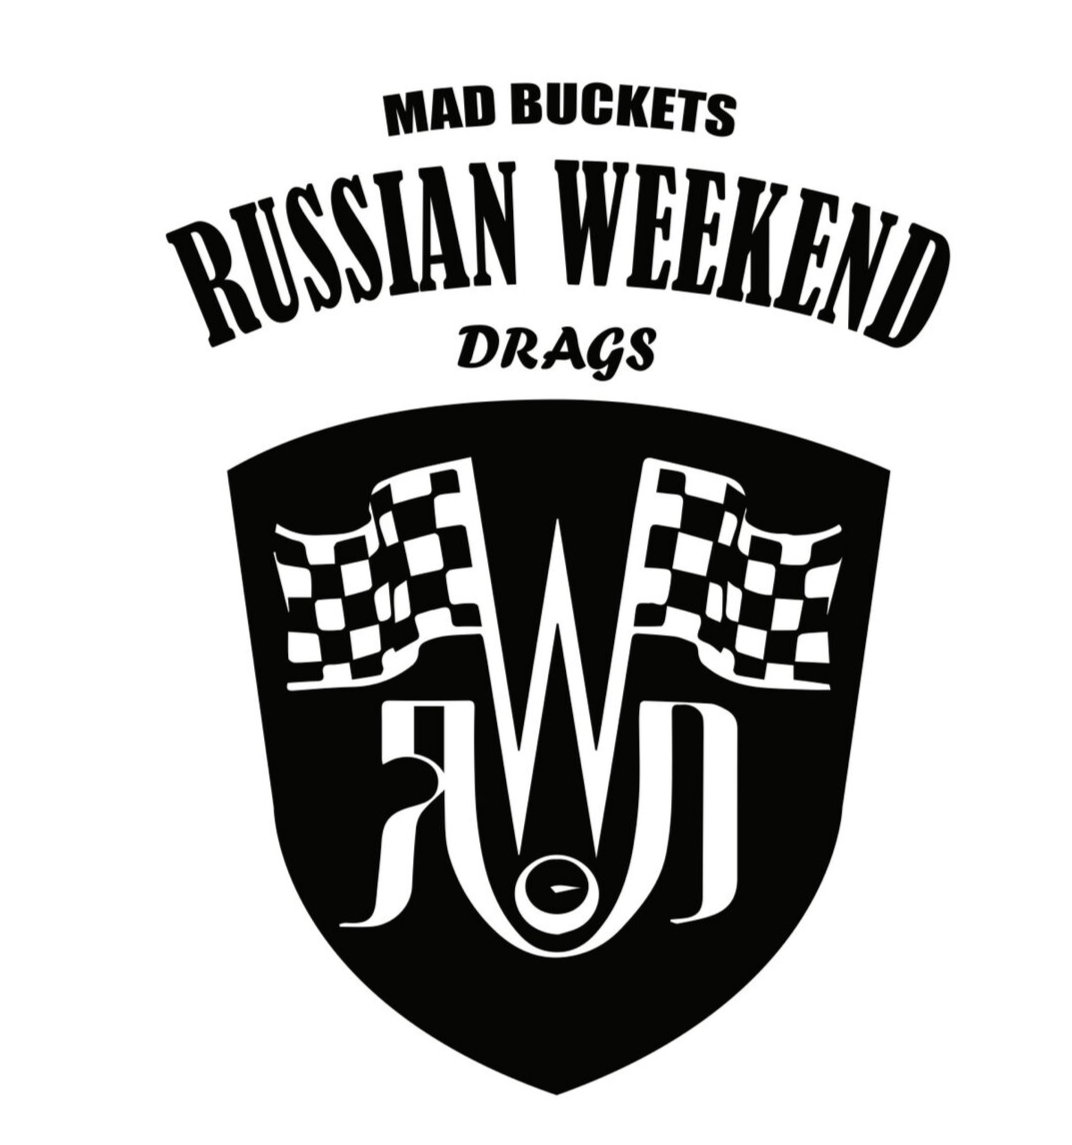 Russian Weekend Drags